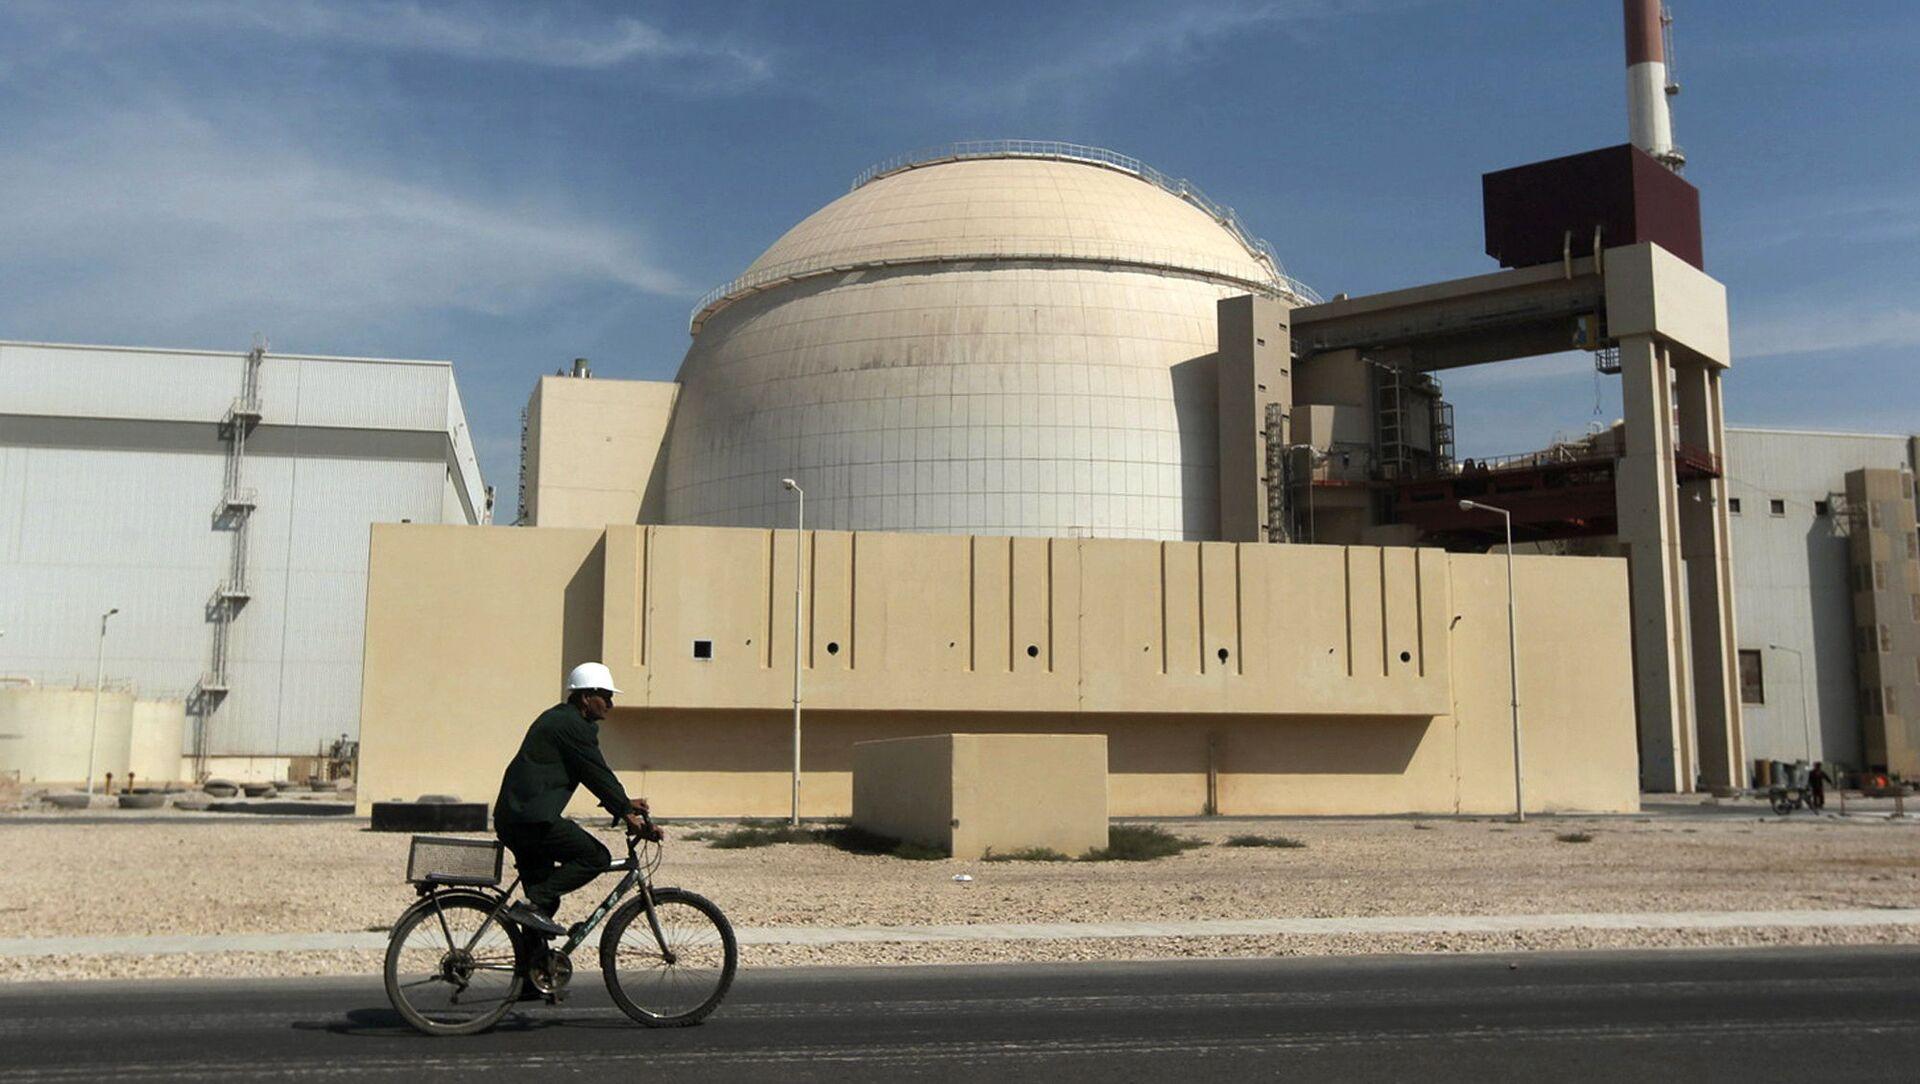 АЭС Бушер в Иране   - Sputnik Azərbaycan, 1920, 05.09.2021